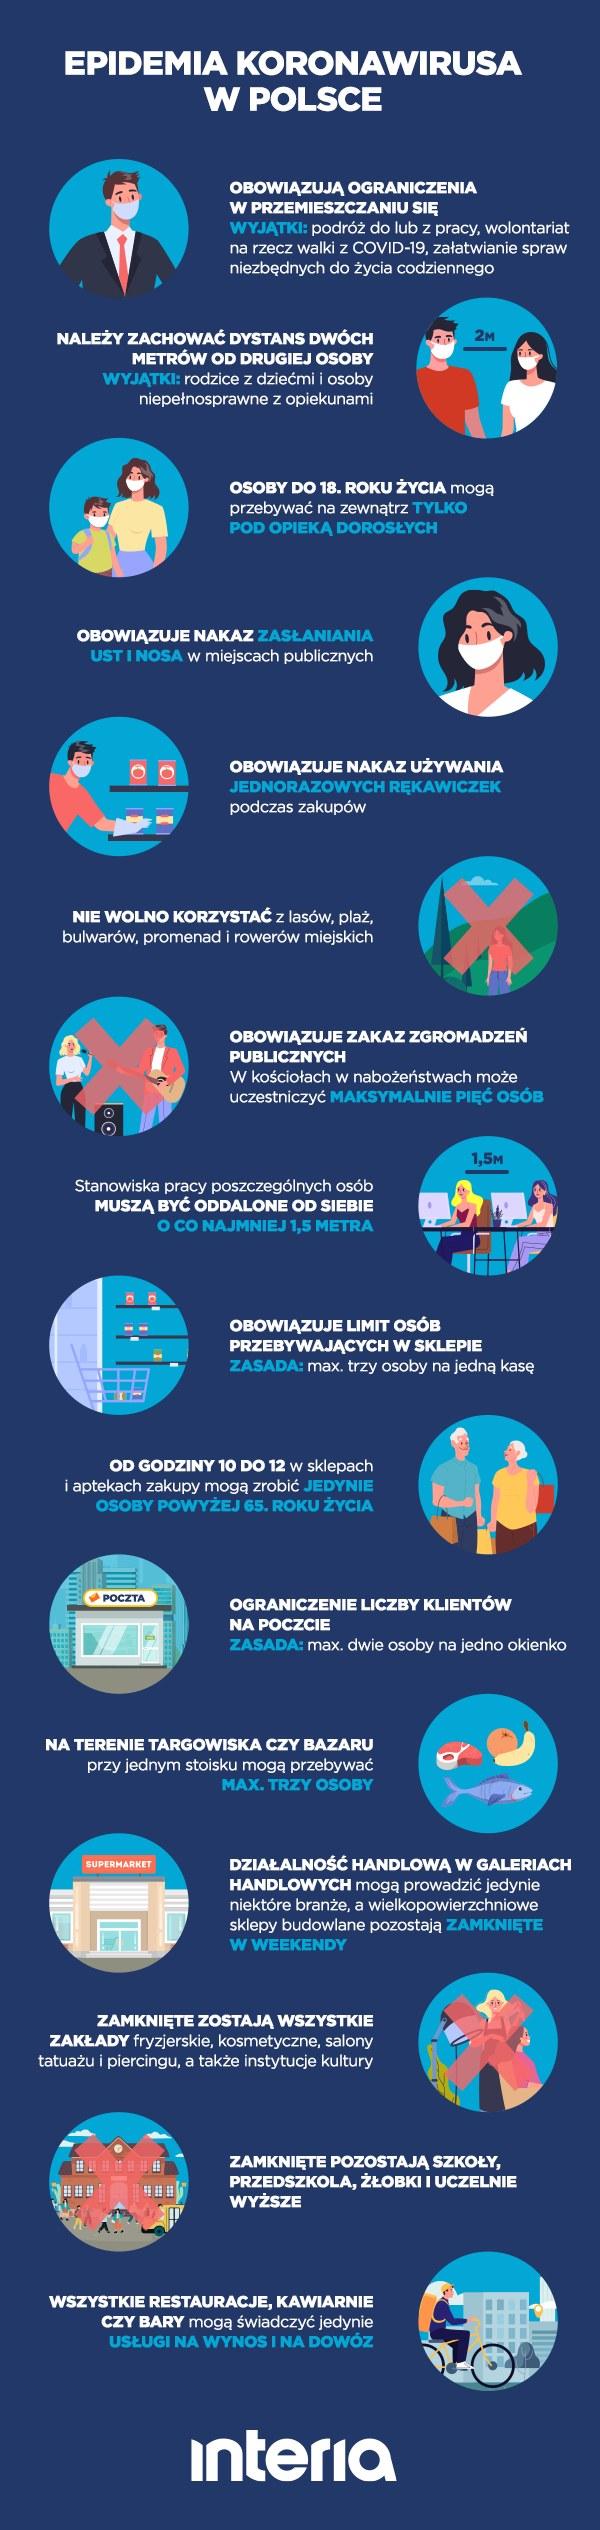 Aktualne zasady i ograniczenia /INTERIA.PL